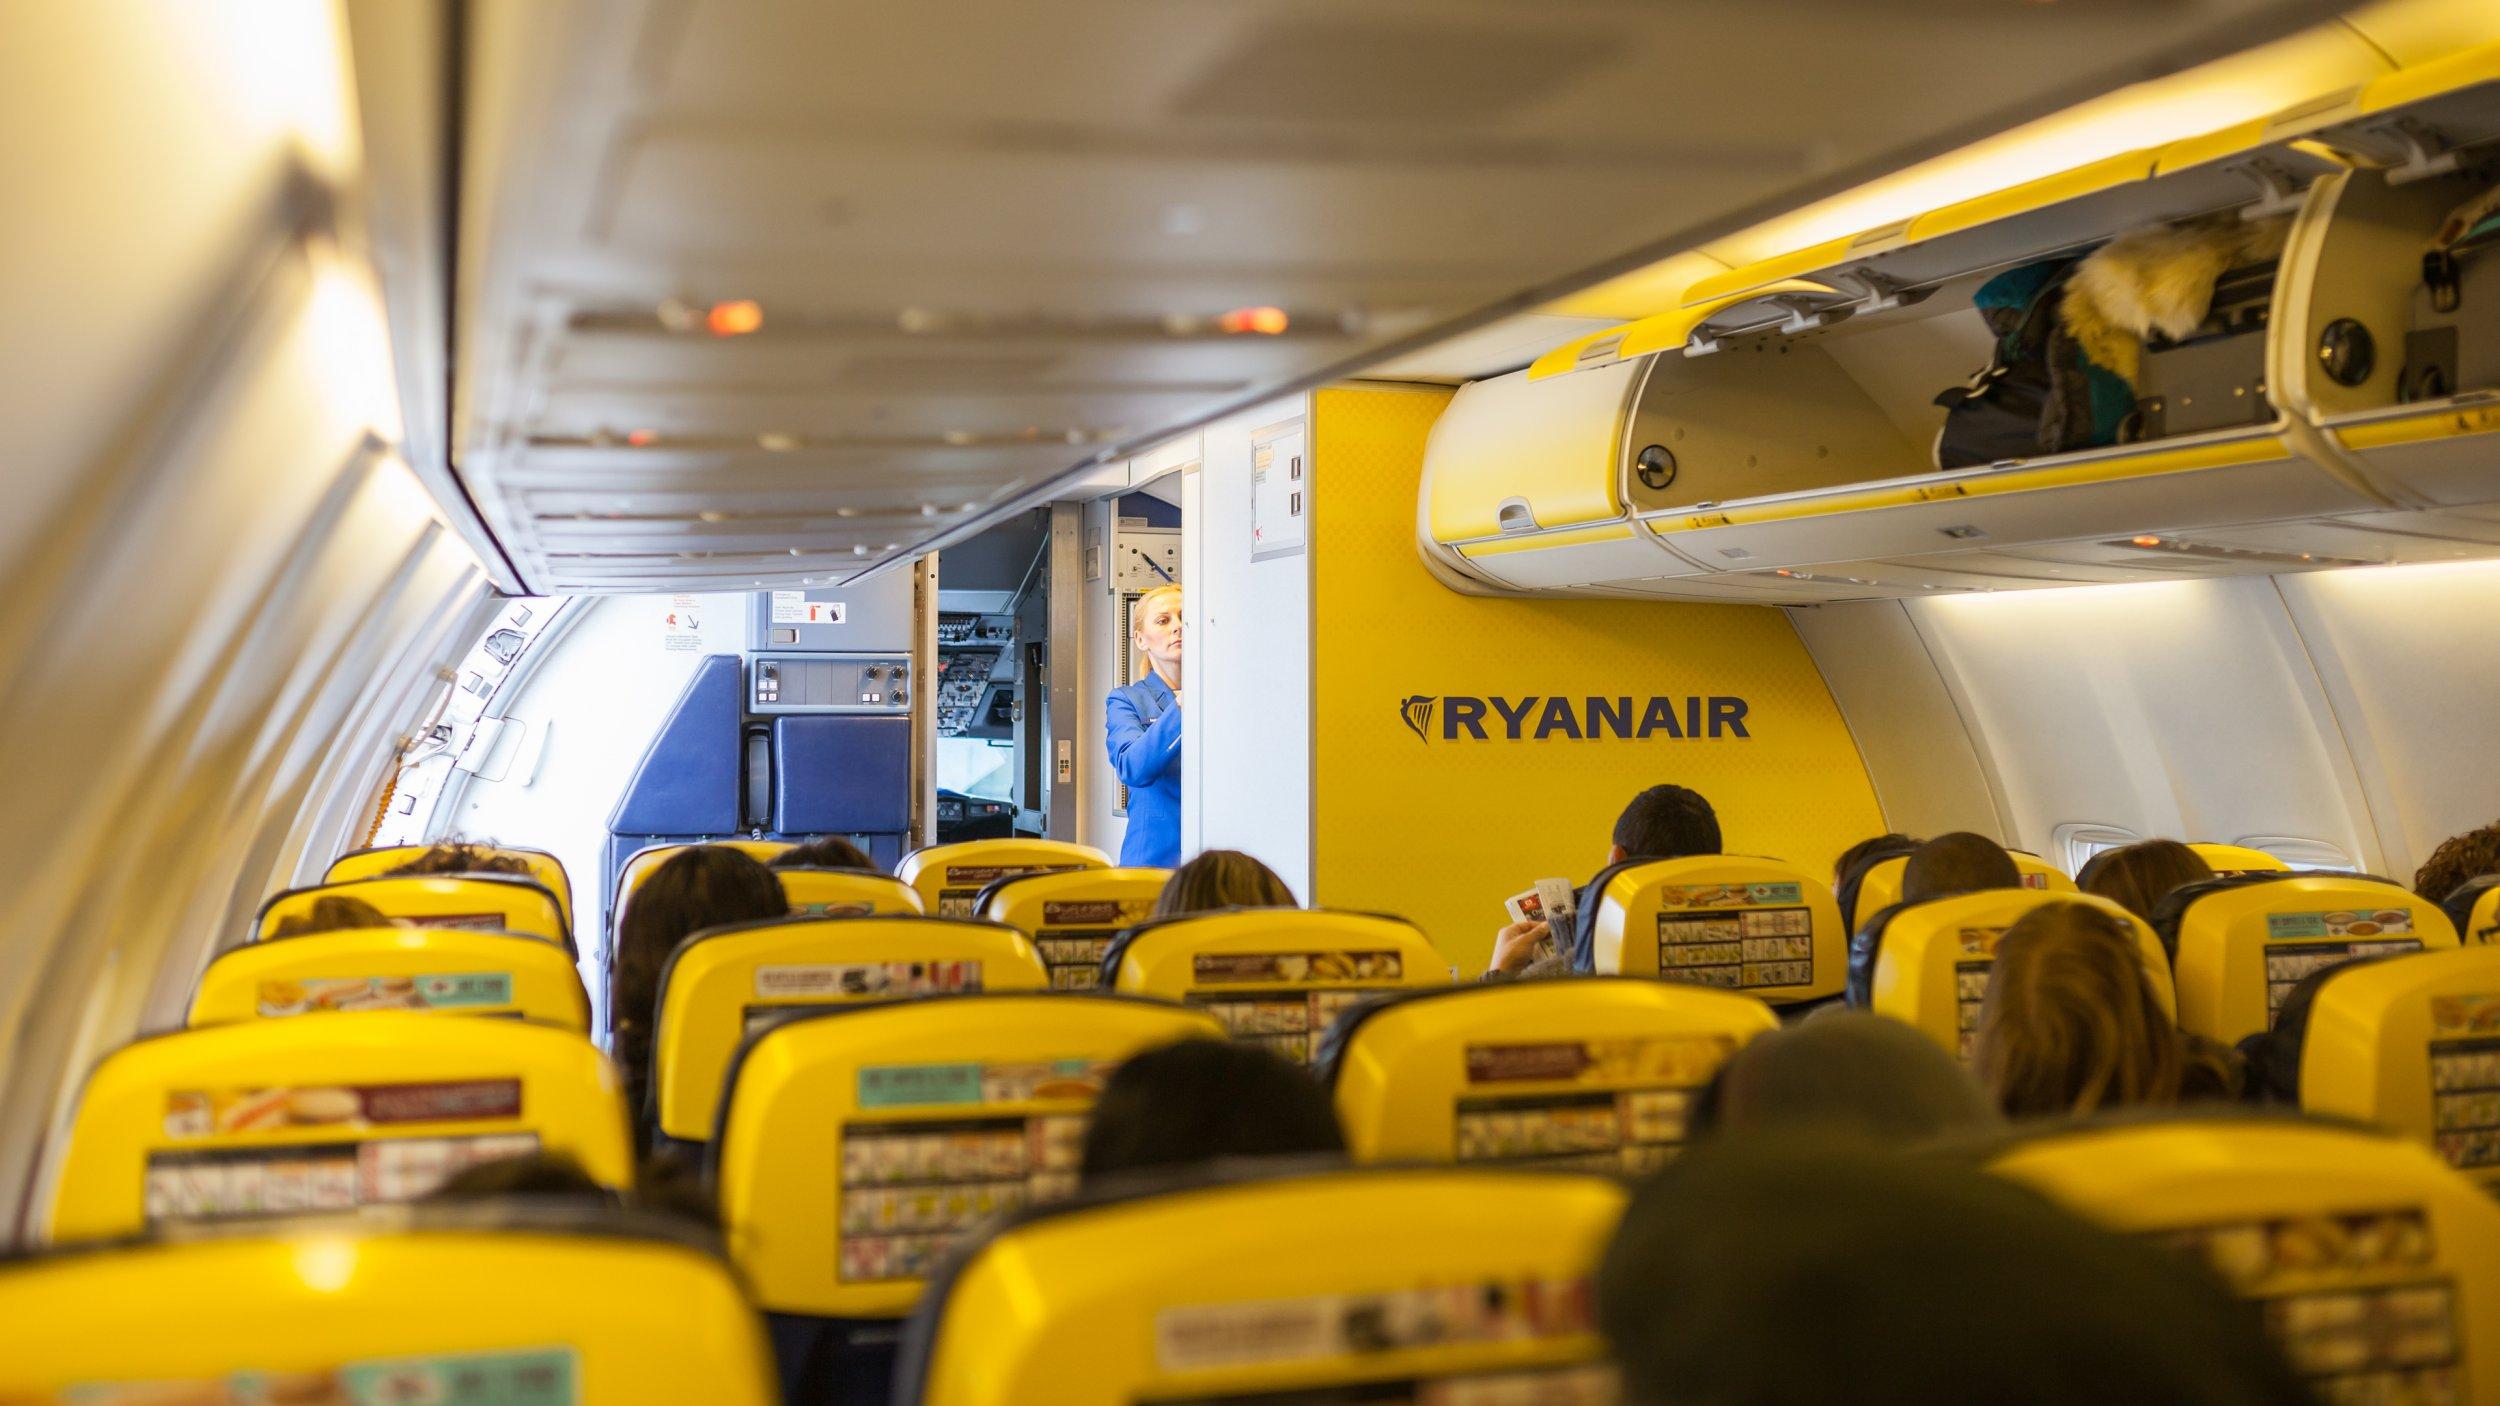 5 Ryanair